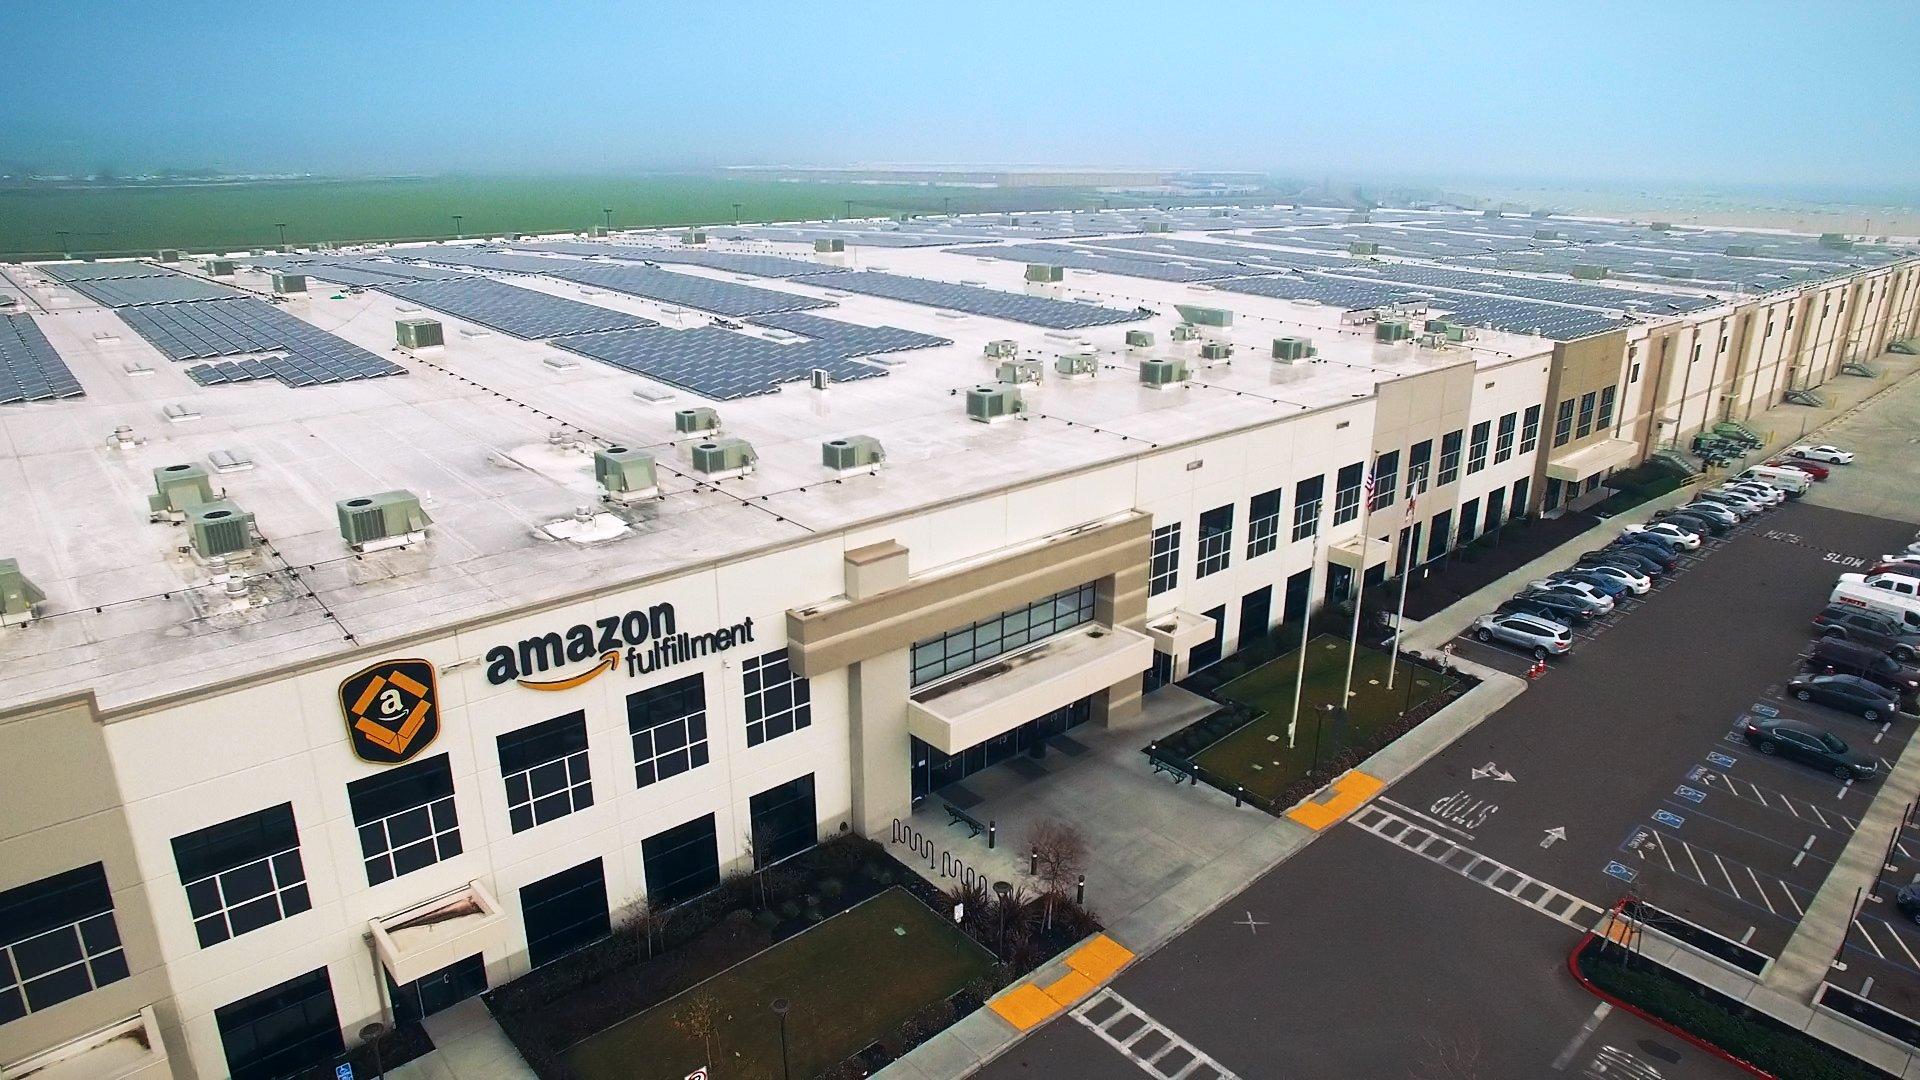 An Amazon fulfillment center.